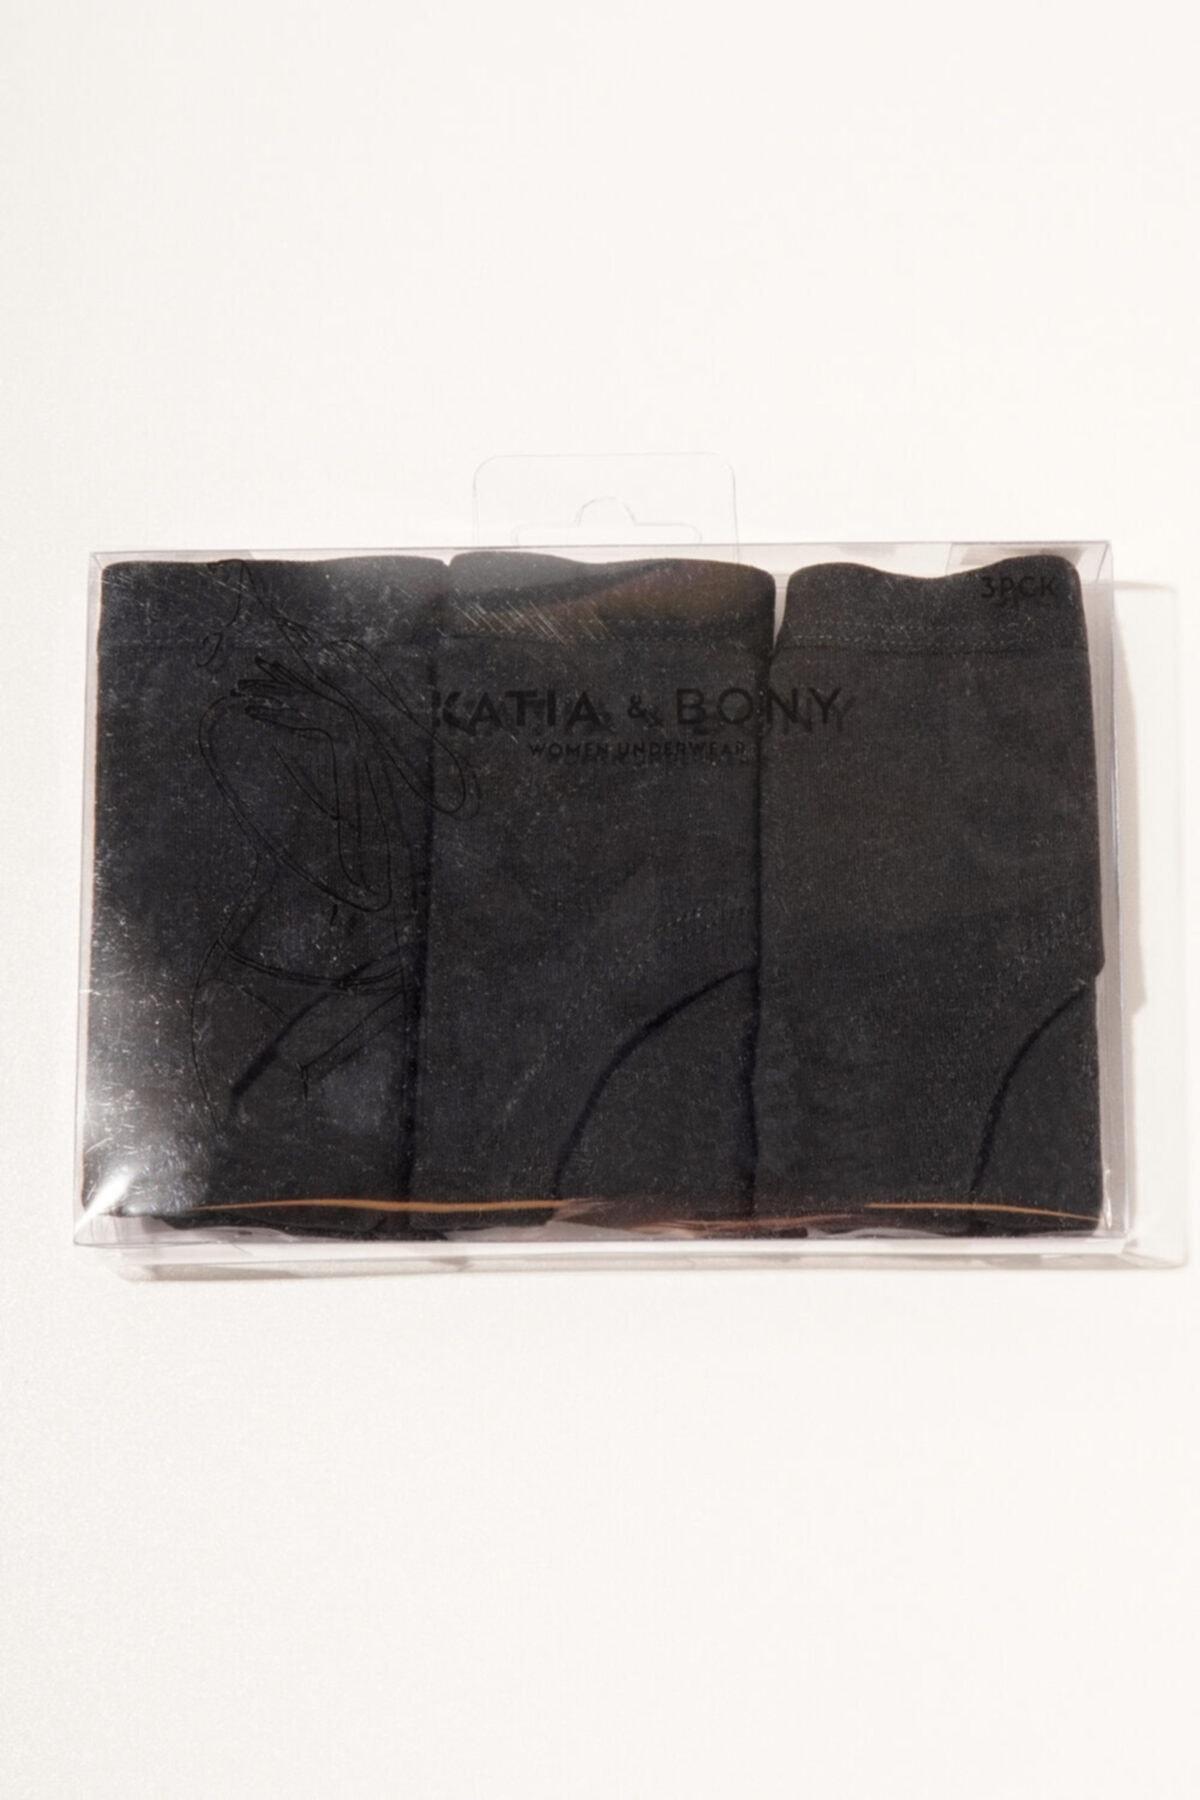 Katia&Bony 3 ' Lü Paket Natural Modal Kadın Hıpster - Siyah/siyah/siyah 2